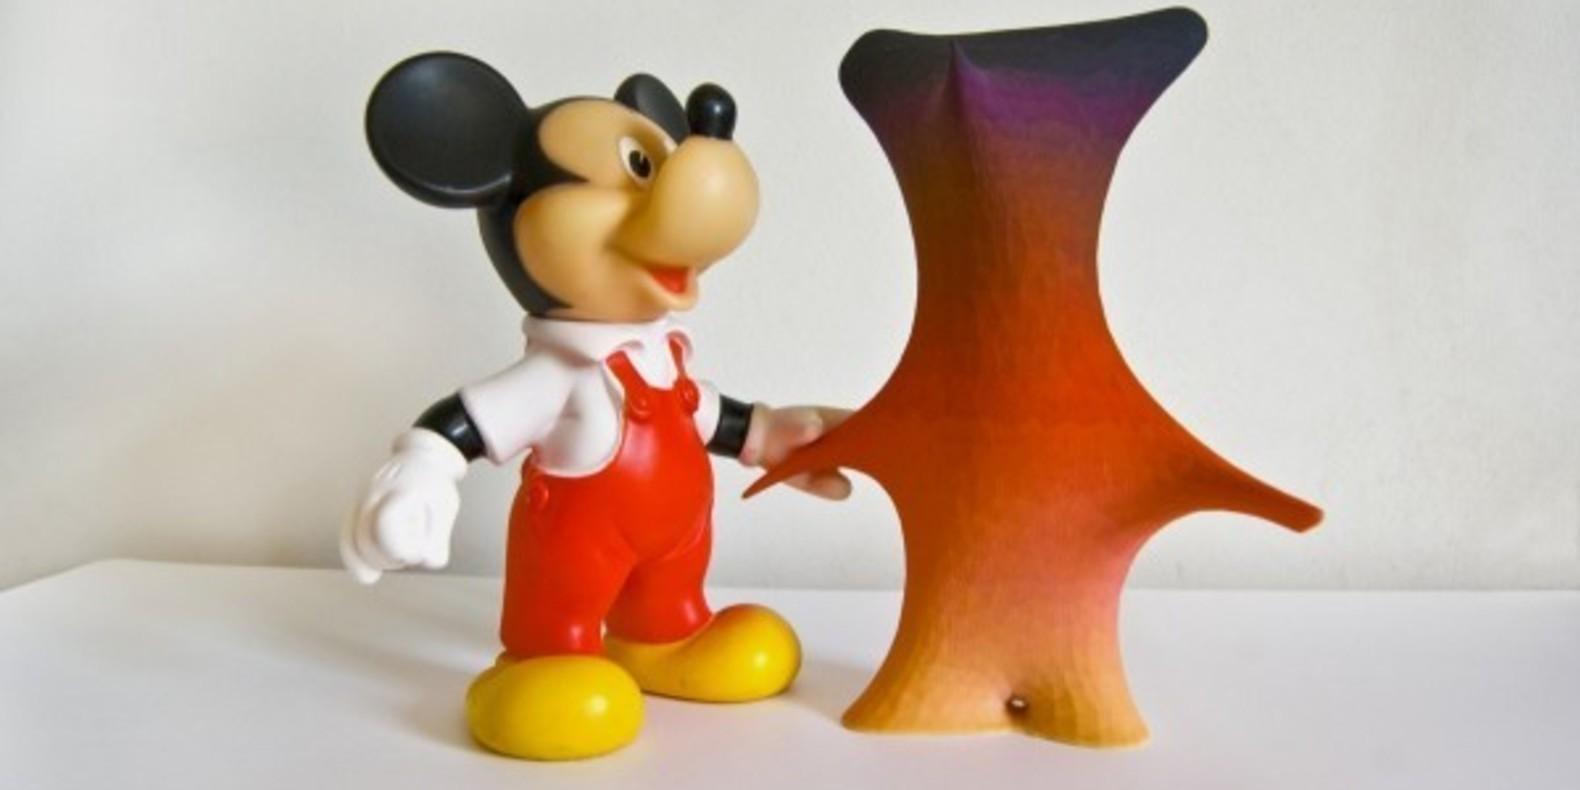 sekuMoiMecy Matthew Plummer-Fernandez impression 3D printing cults fichier mickey mouse 7